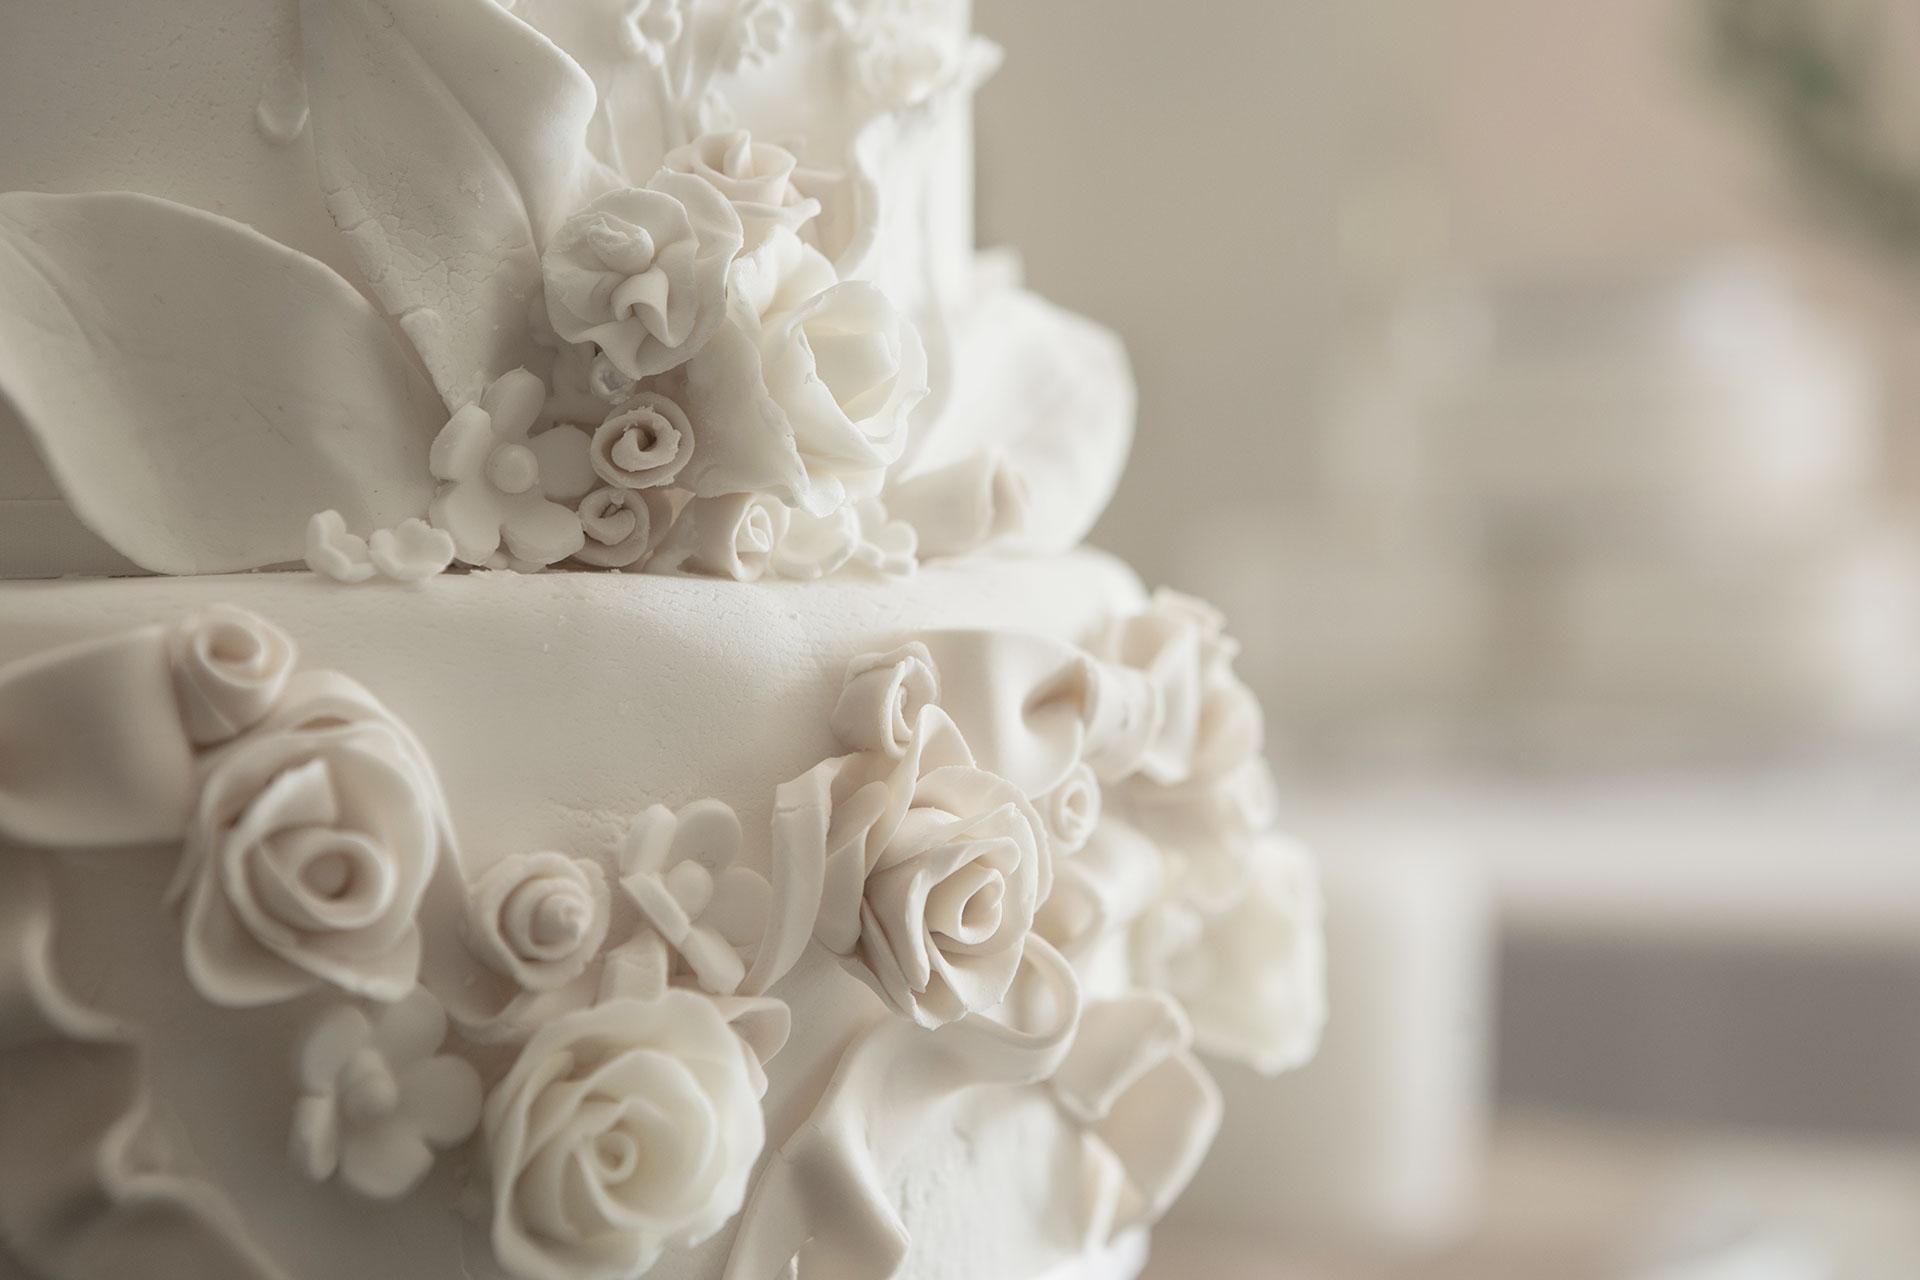 Wedding Cakes - Remnant Fellowship Weddings